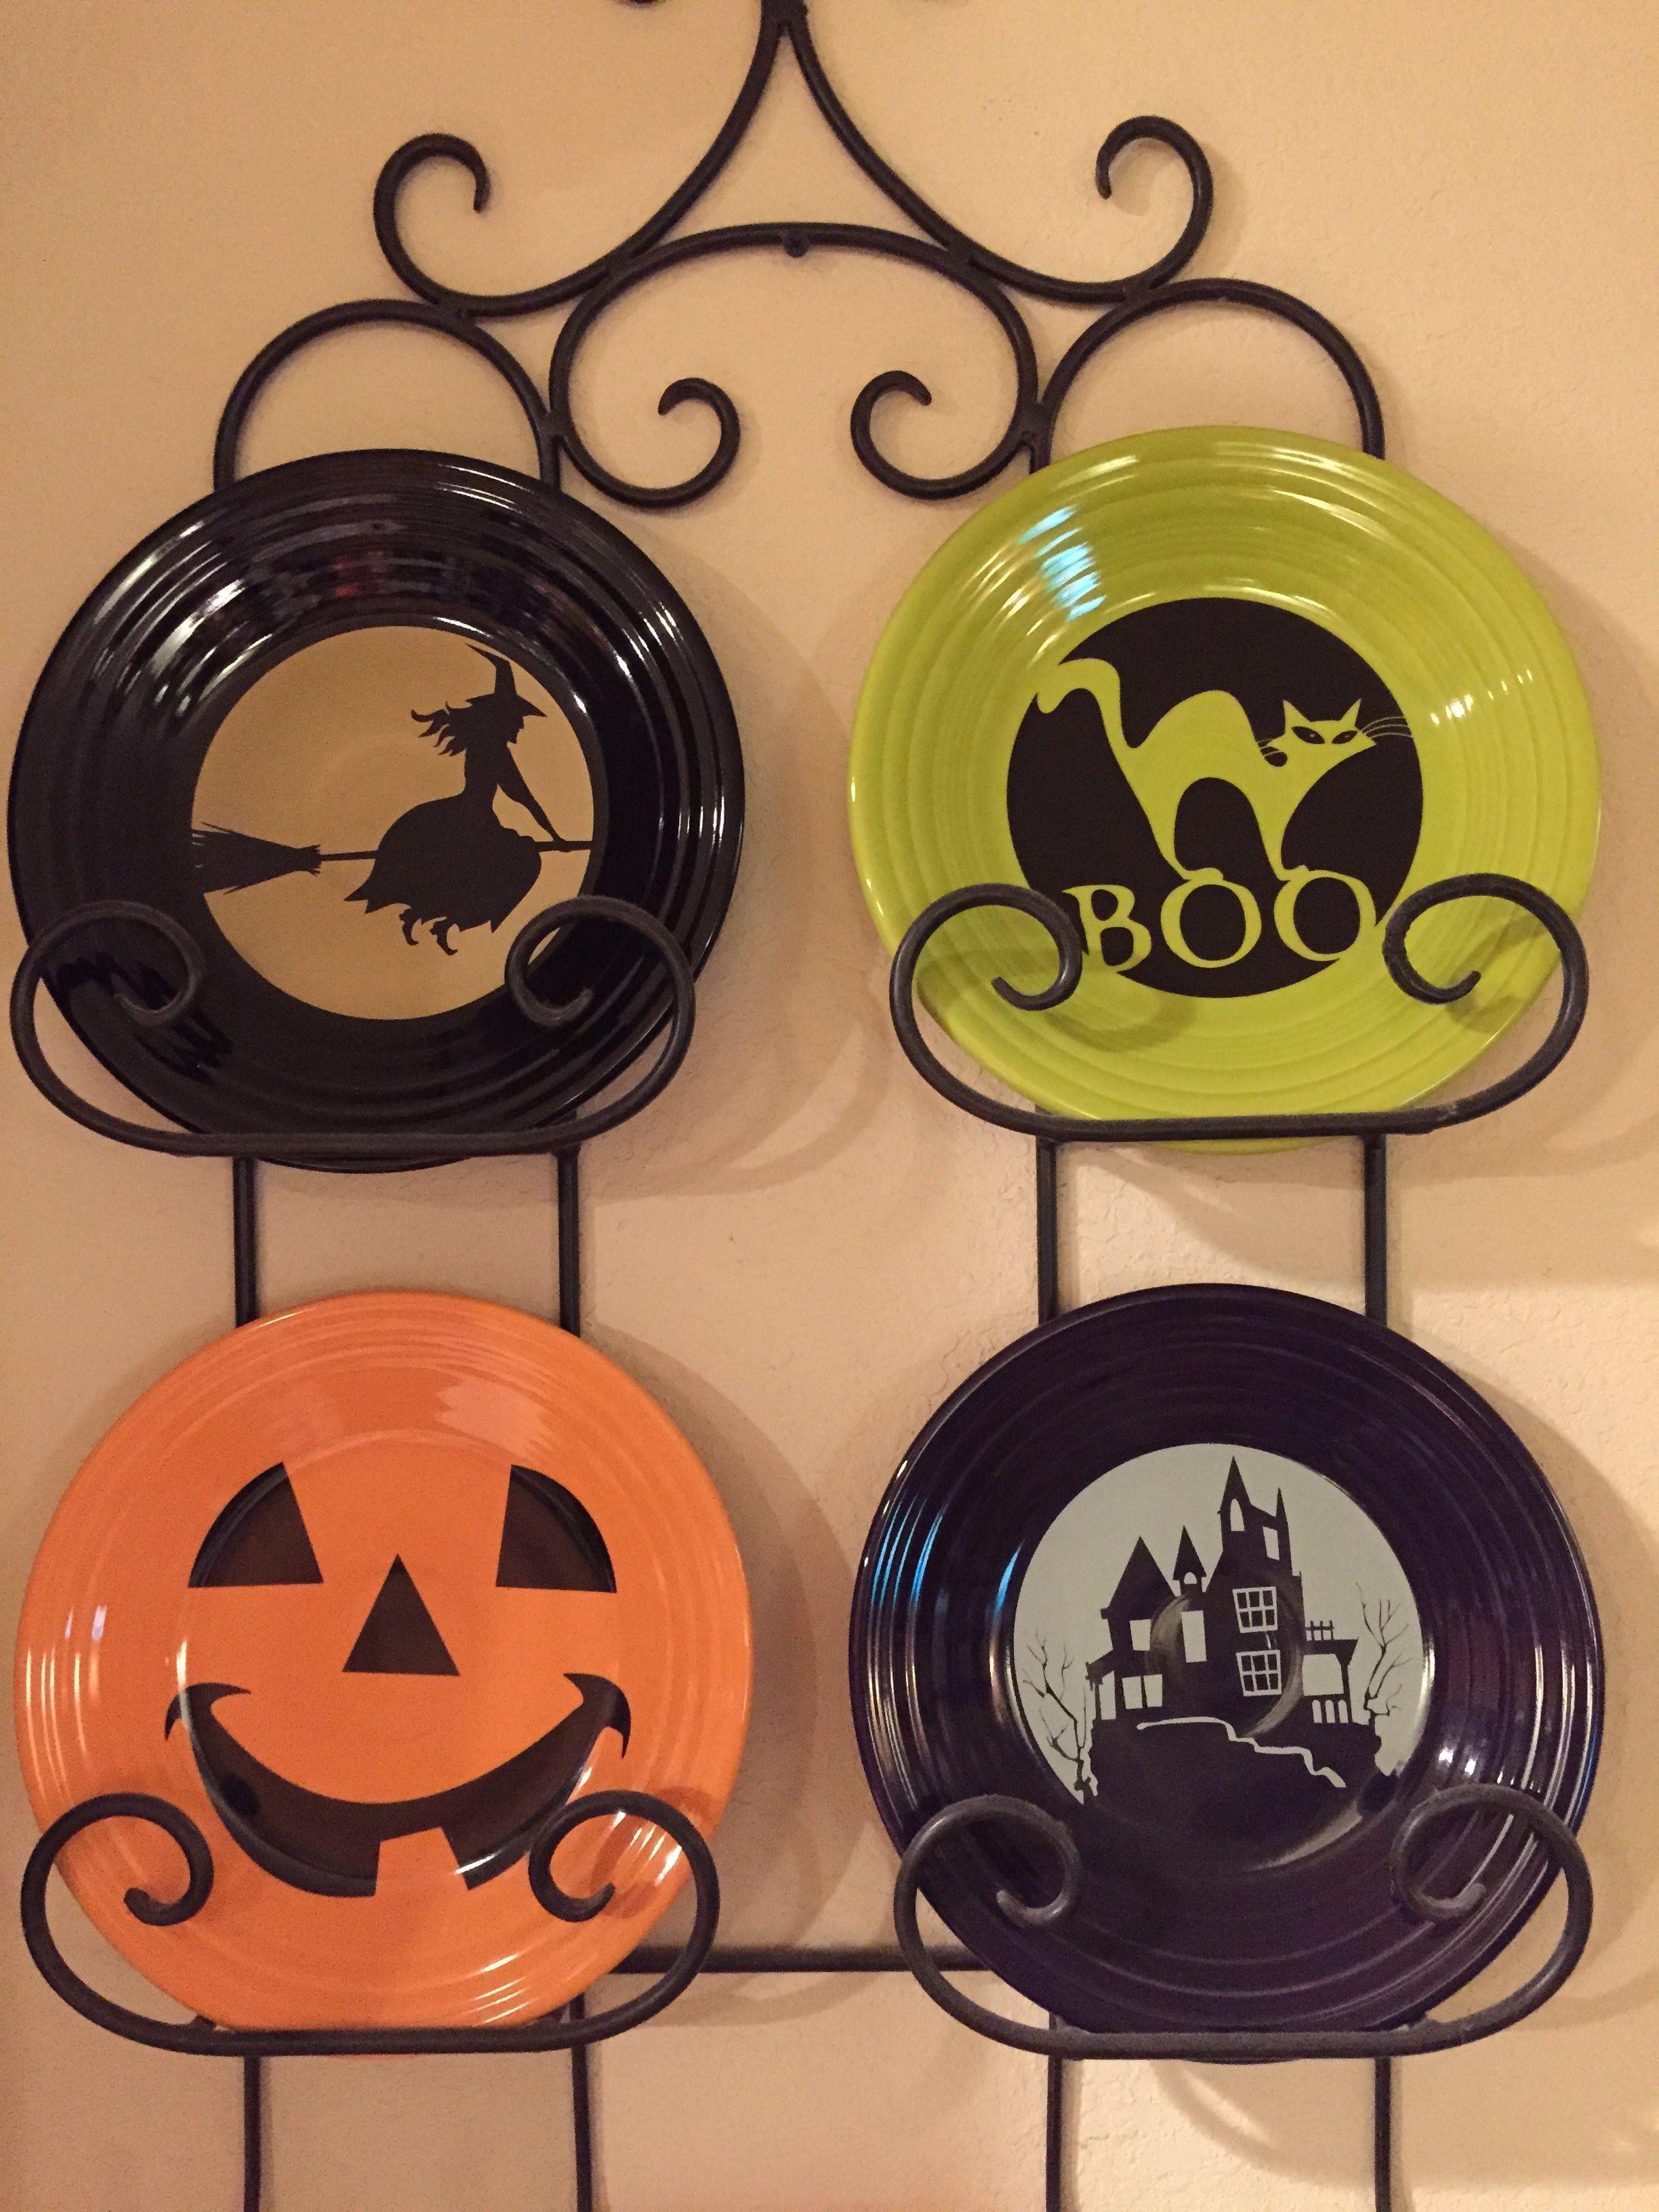 fiesta moon lit witch on black boo cat on lemongrass happy pumpkin on tangerine spooky haunted house on plum